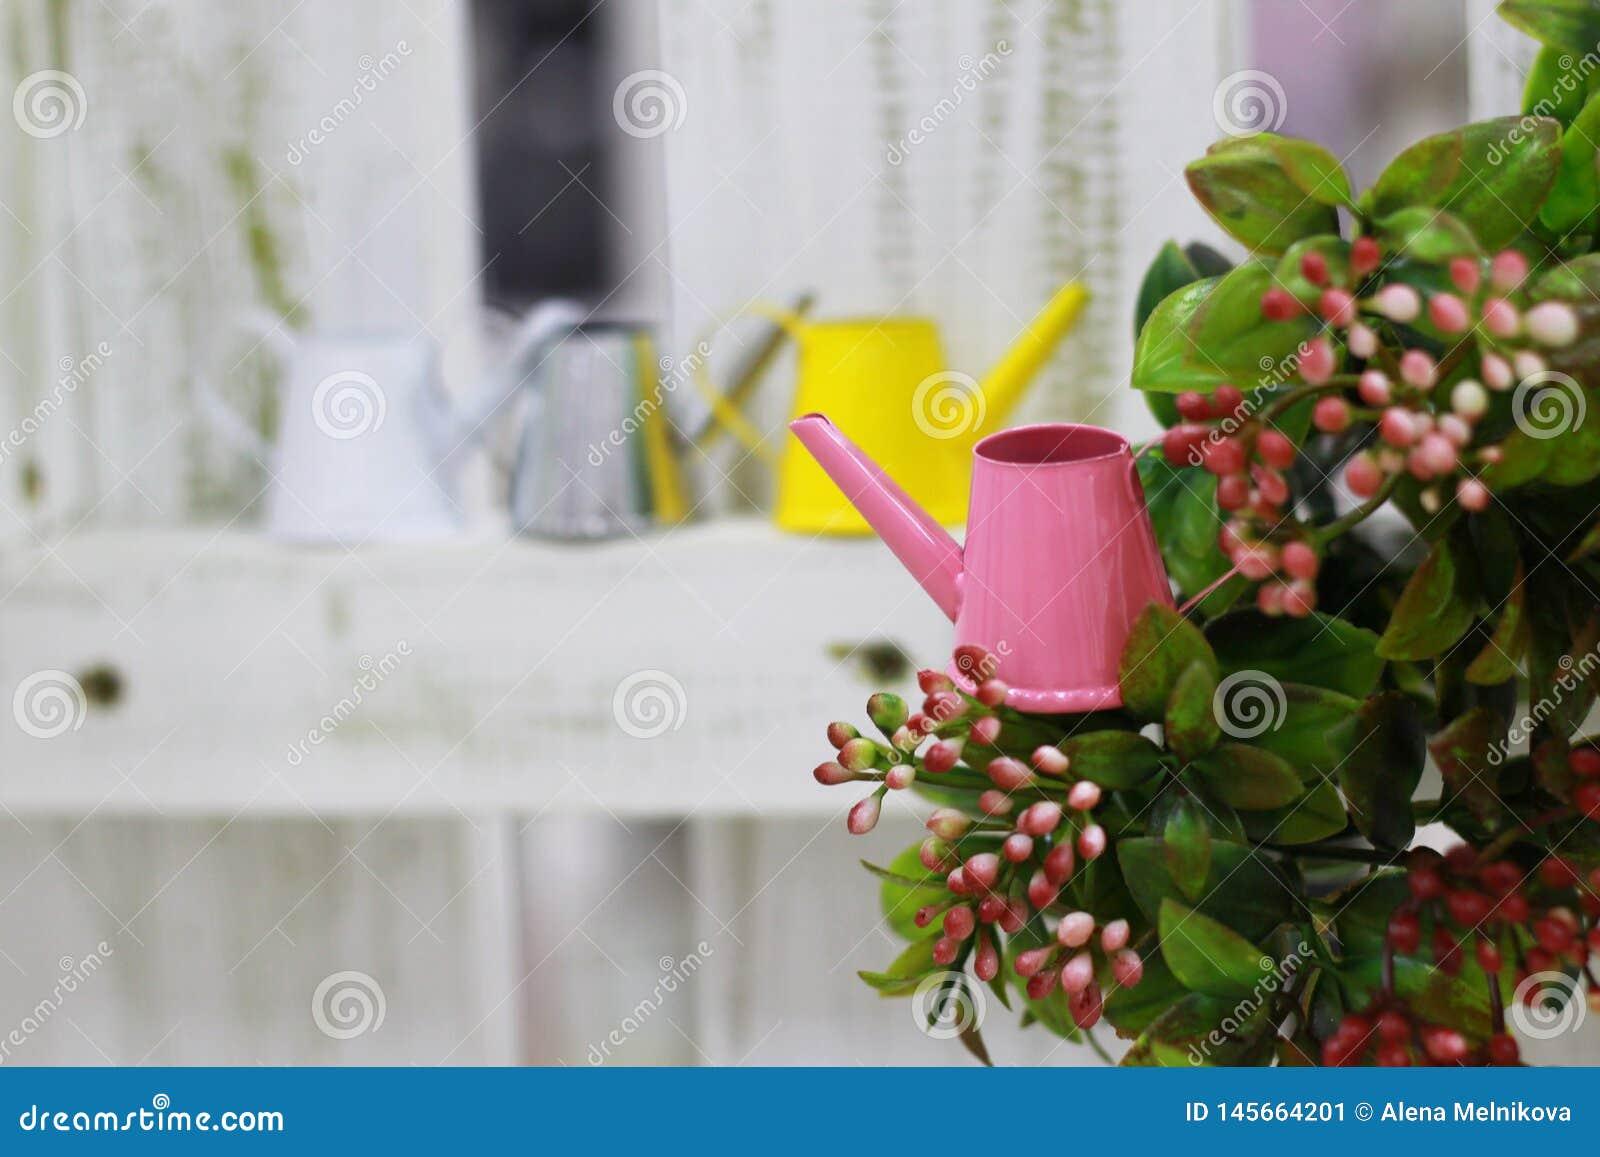 Weinig roze gieter op een groene struik